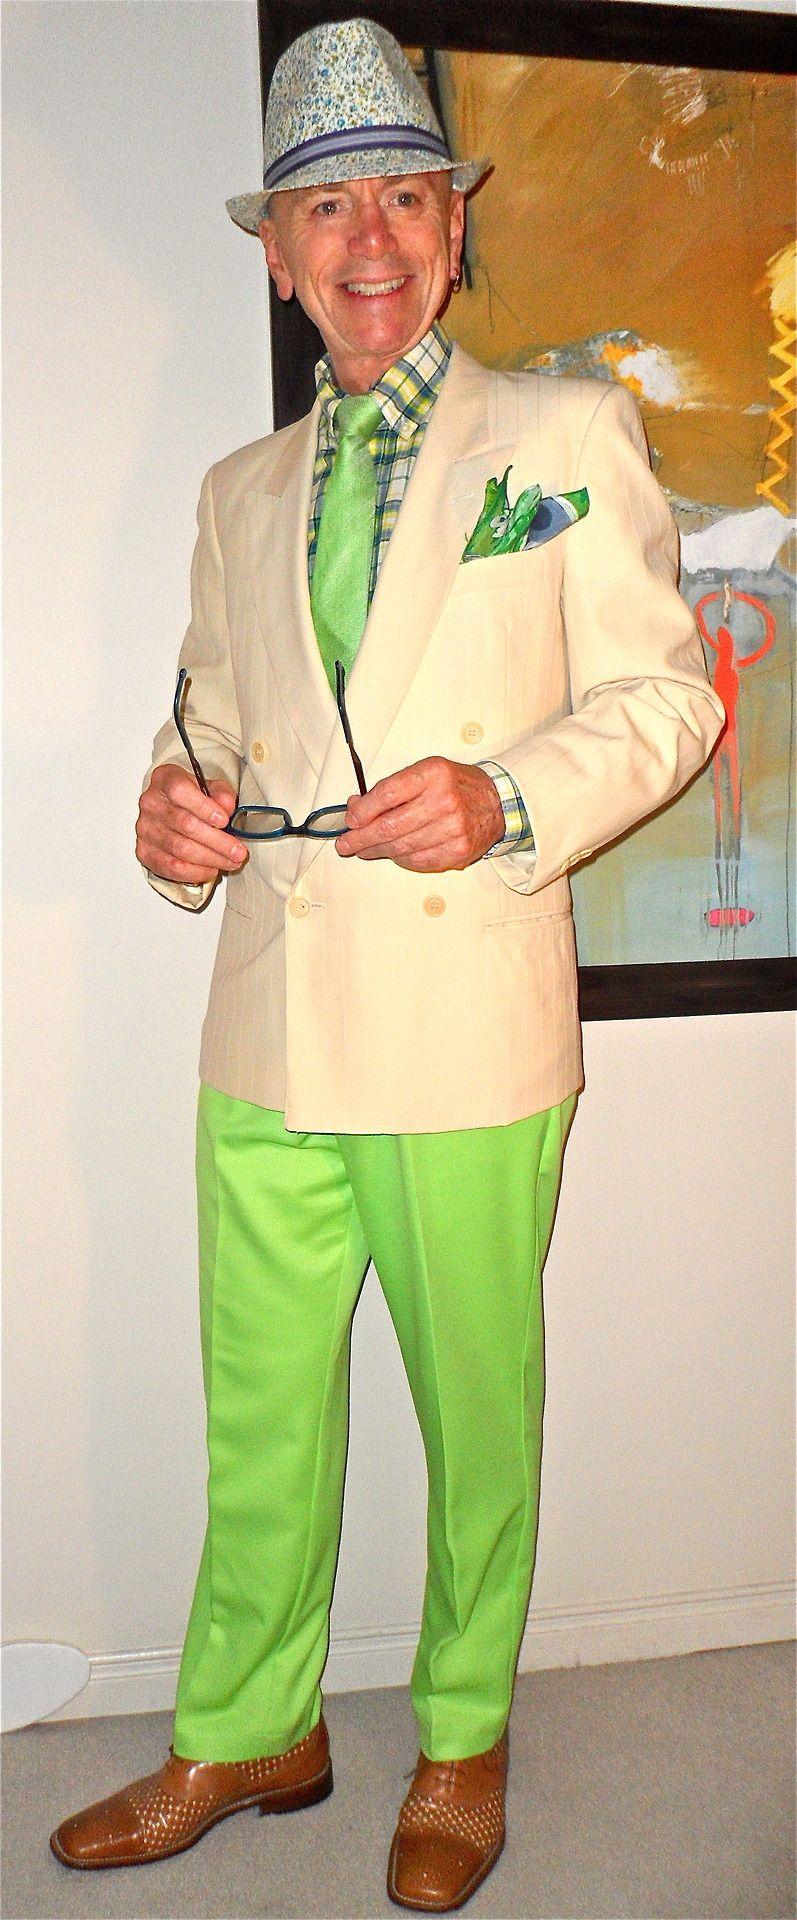 Saks Fifth Avenue Corneliani DB blazer, Jo Fresh shirt, Sondergaard tie, pocket square from the amazingly talented Canadian silk artist Laura Elderton (go to Etsy under LauraElderton), Izod pants, Mezlan woven leather two-tone shoes…